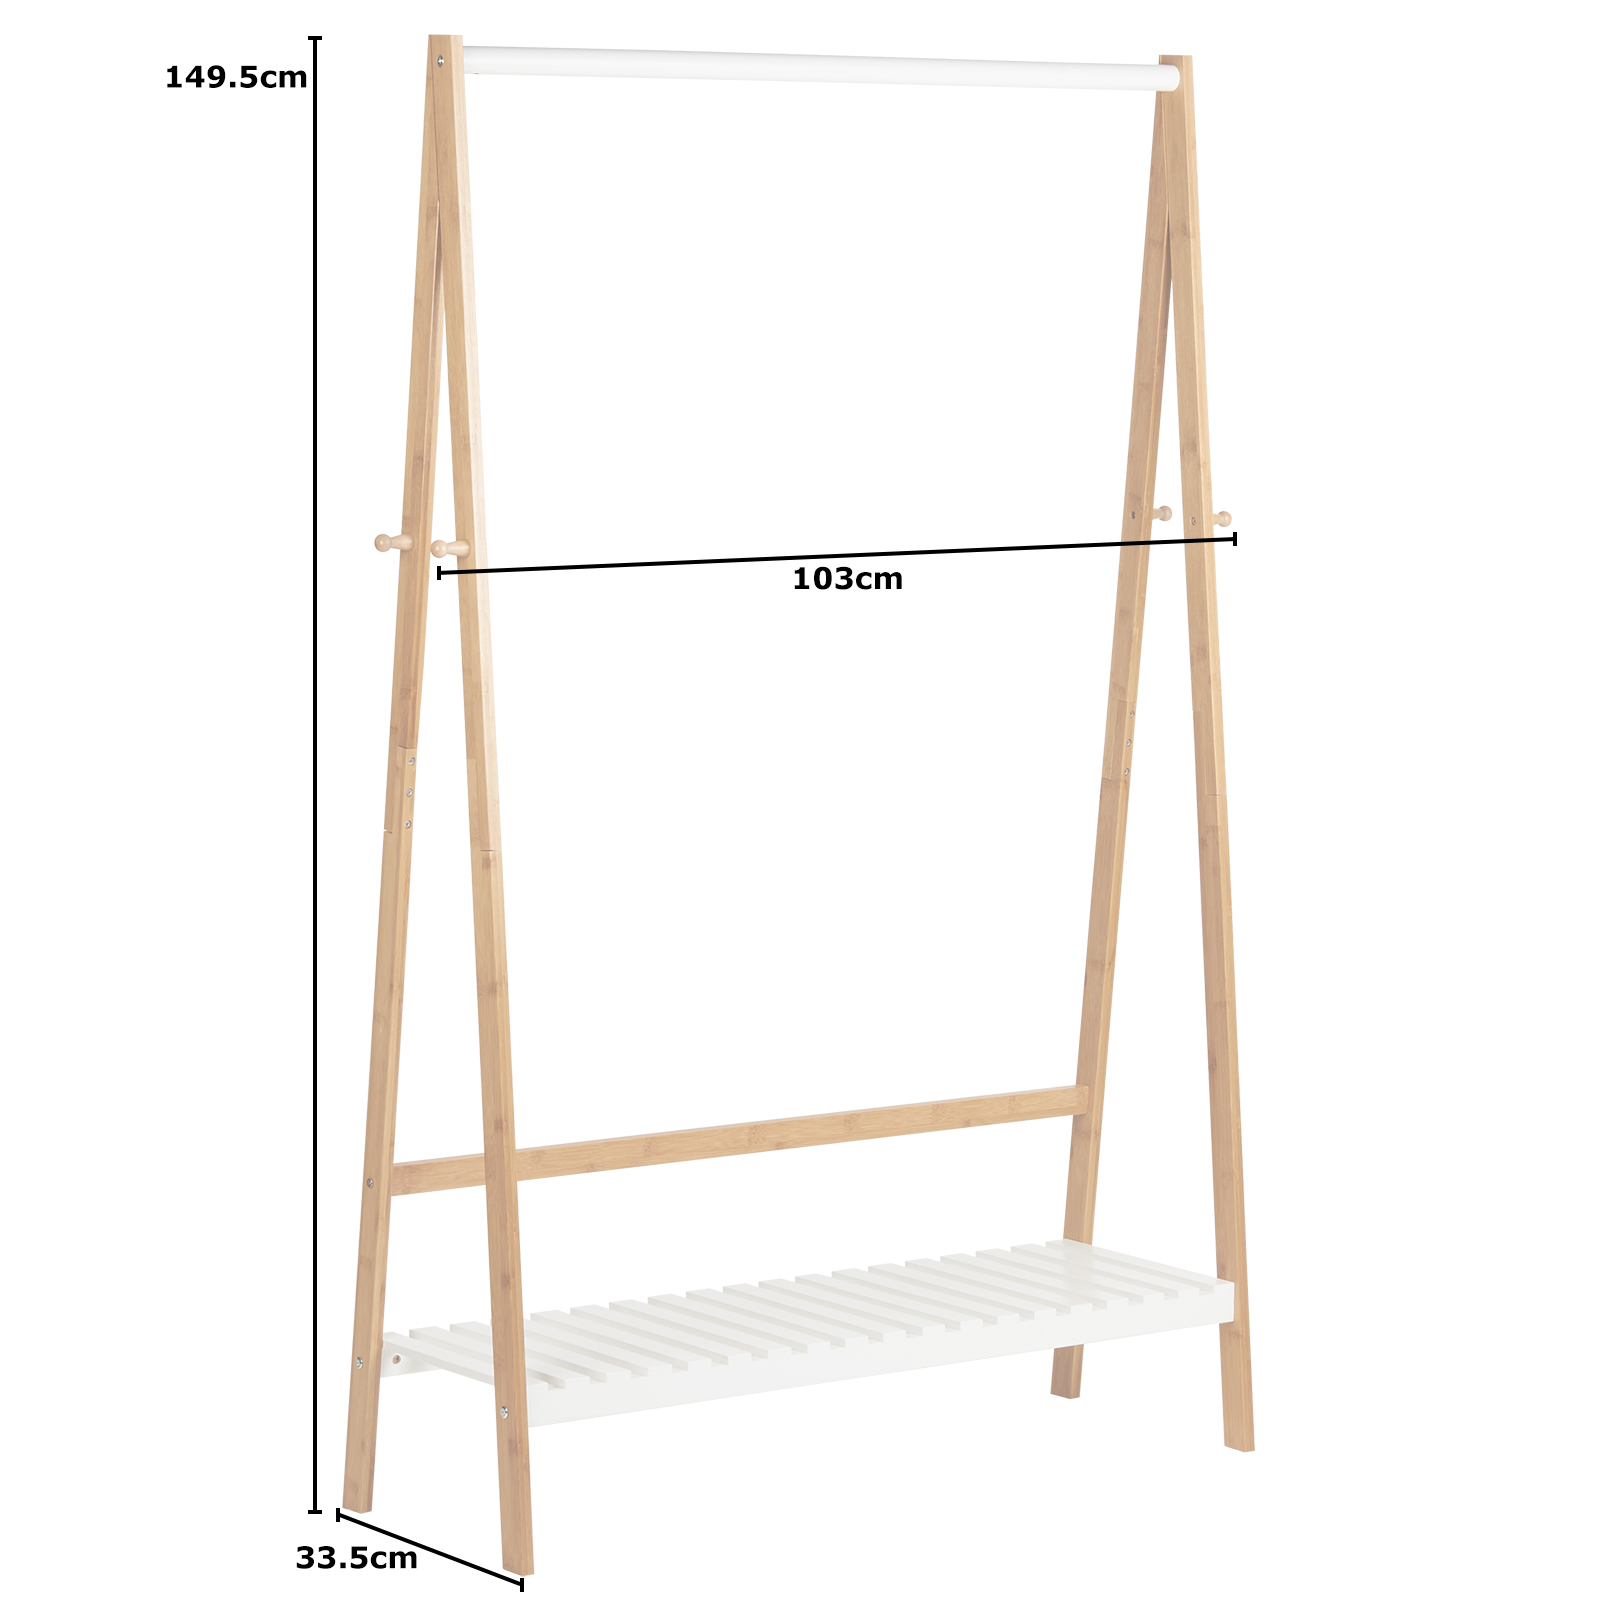 Stand Appendiabiti.Hartleys Stand Appendiabiti Bianco Bambu Scaffale Regale Armadi